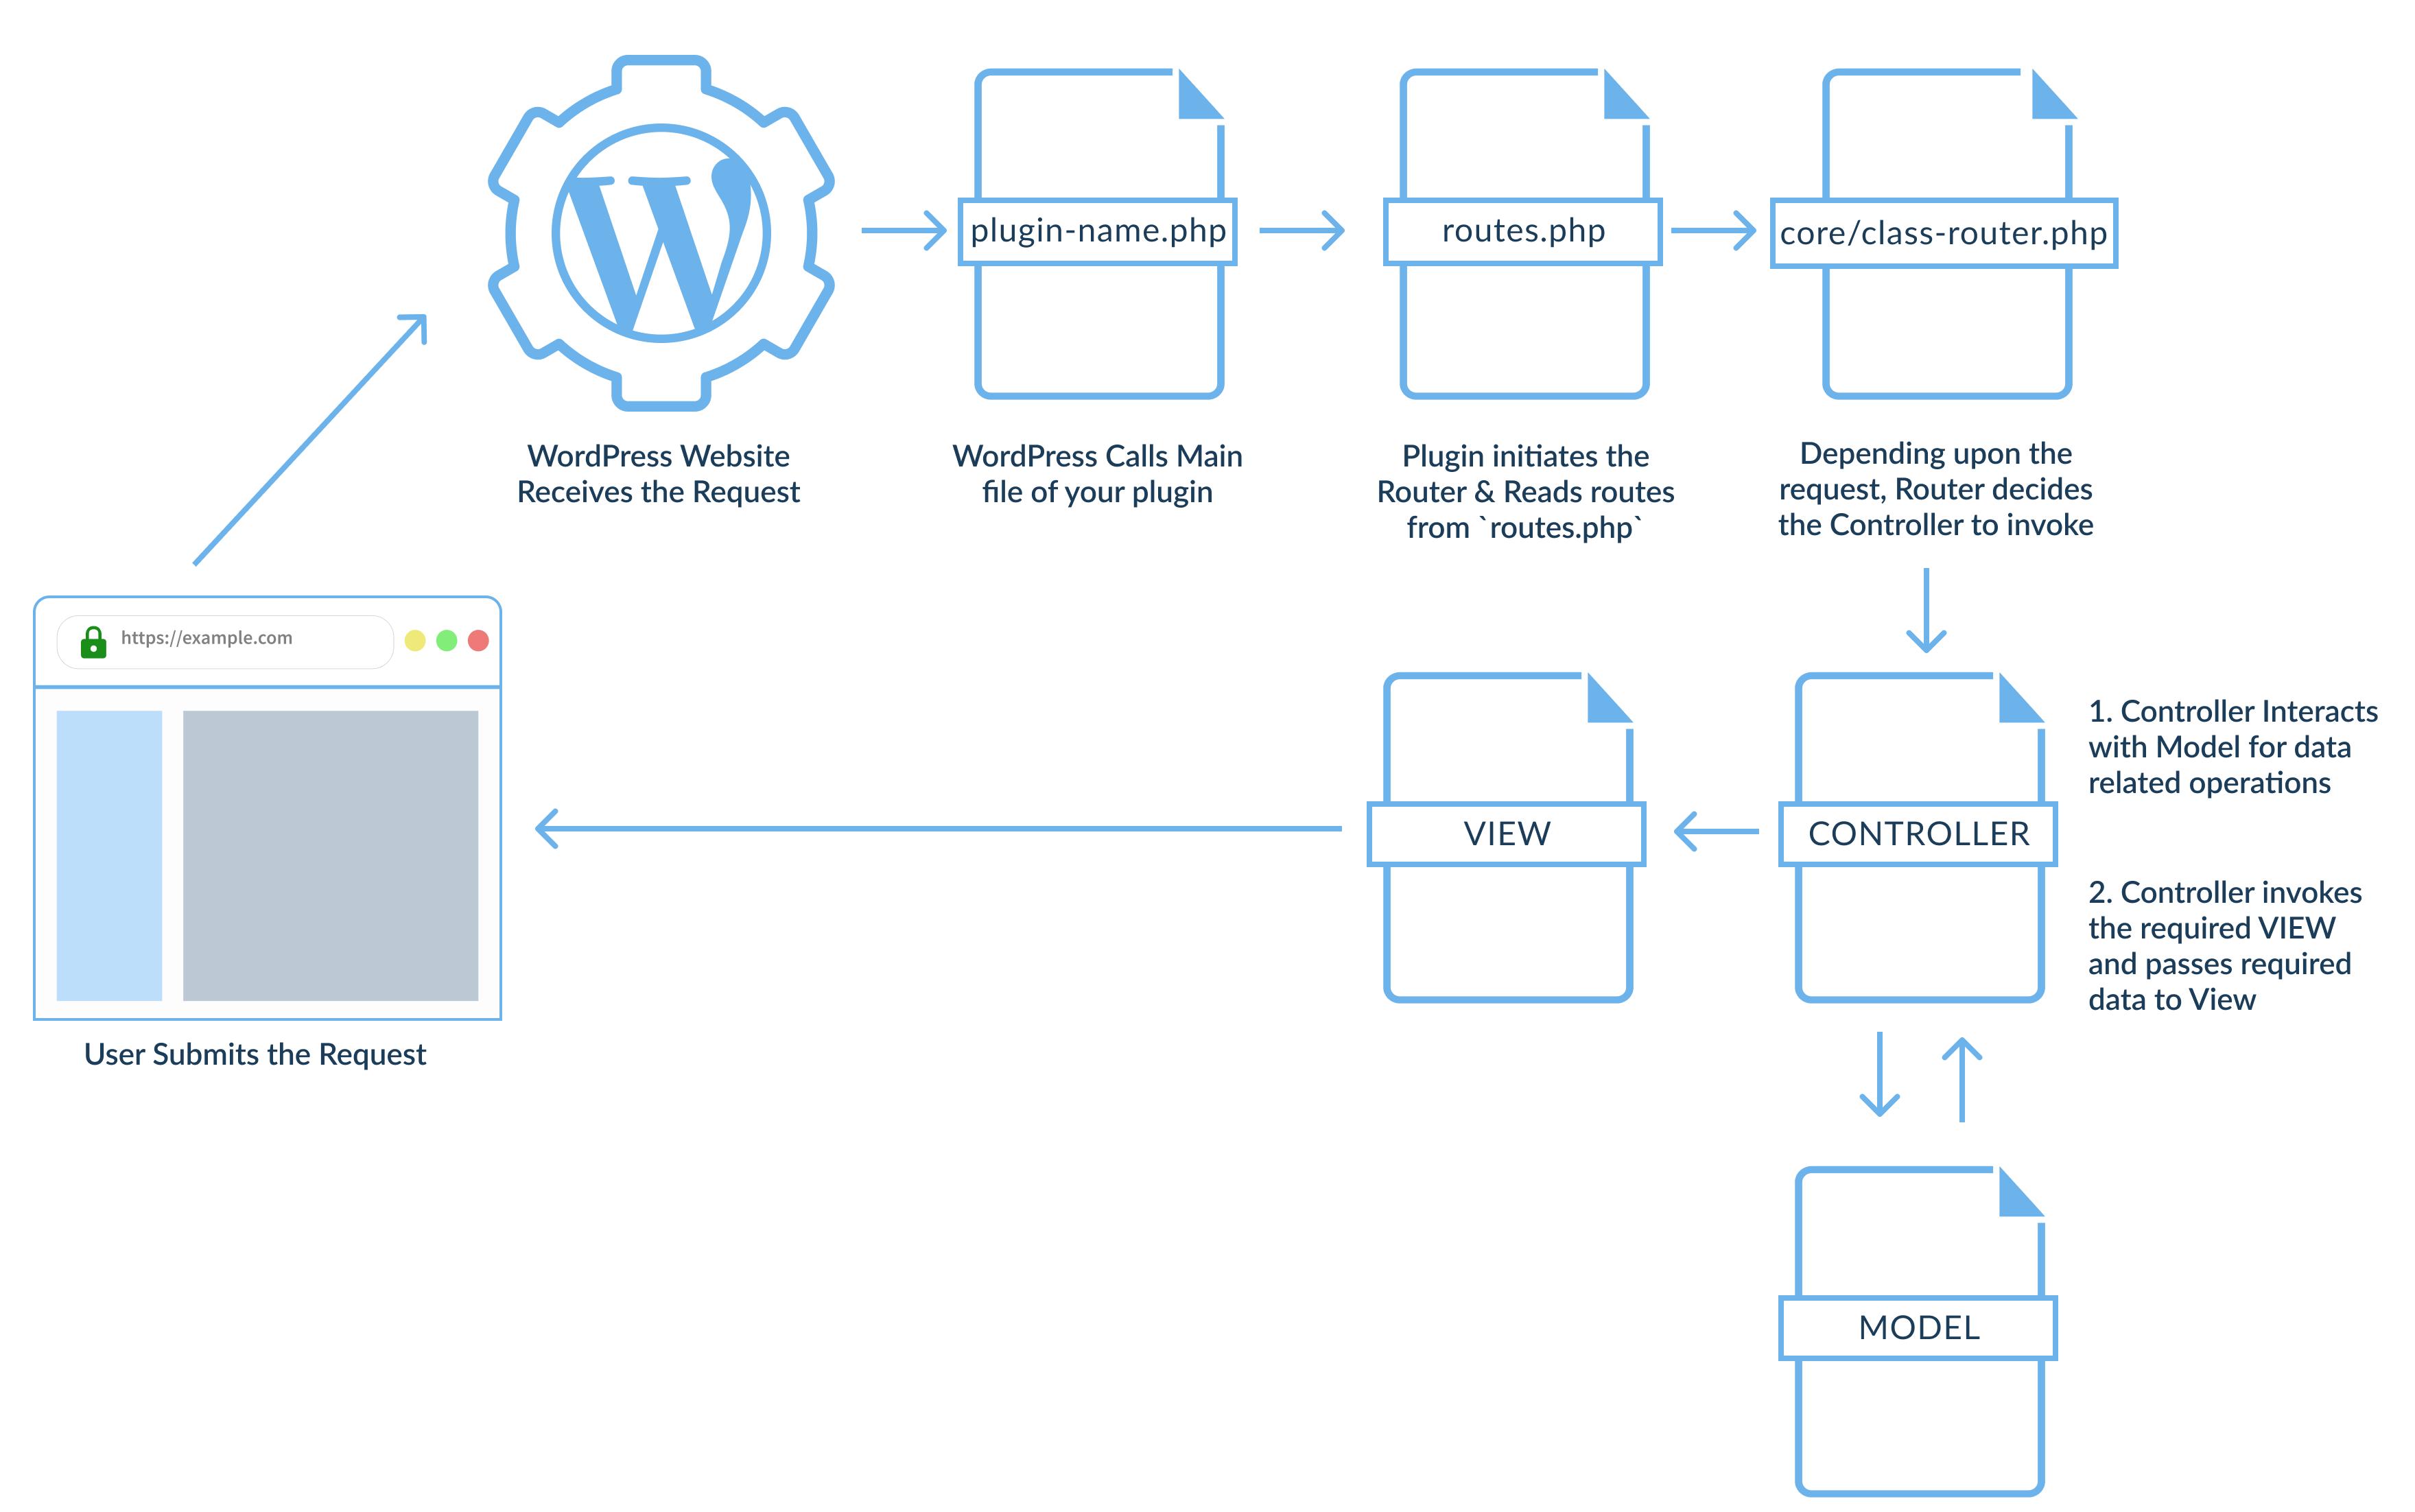 GitHub - sumitpore/mvc-plugin-boilerplate-for-wordpress: An MVC